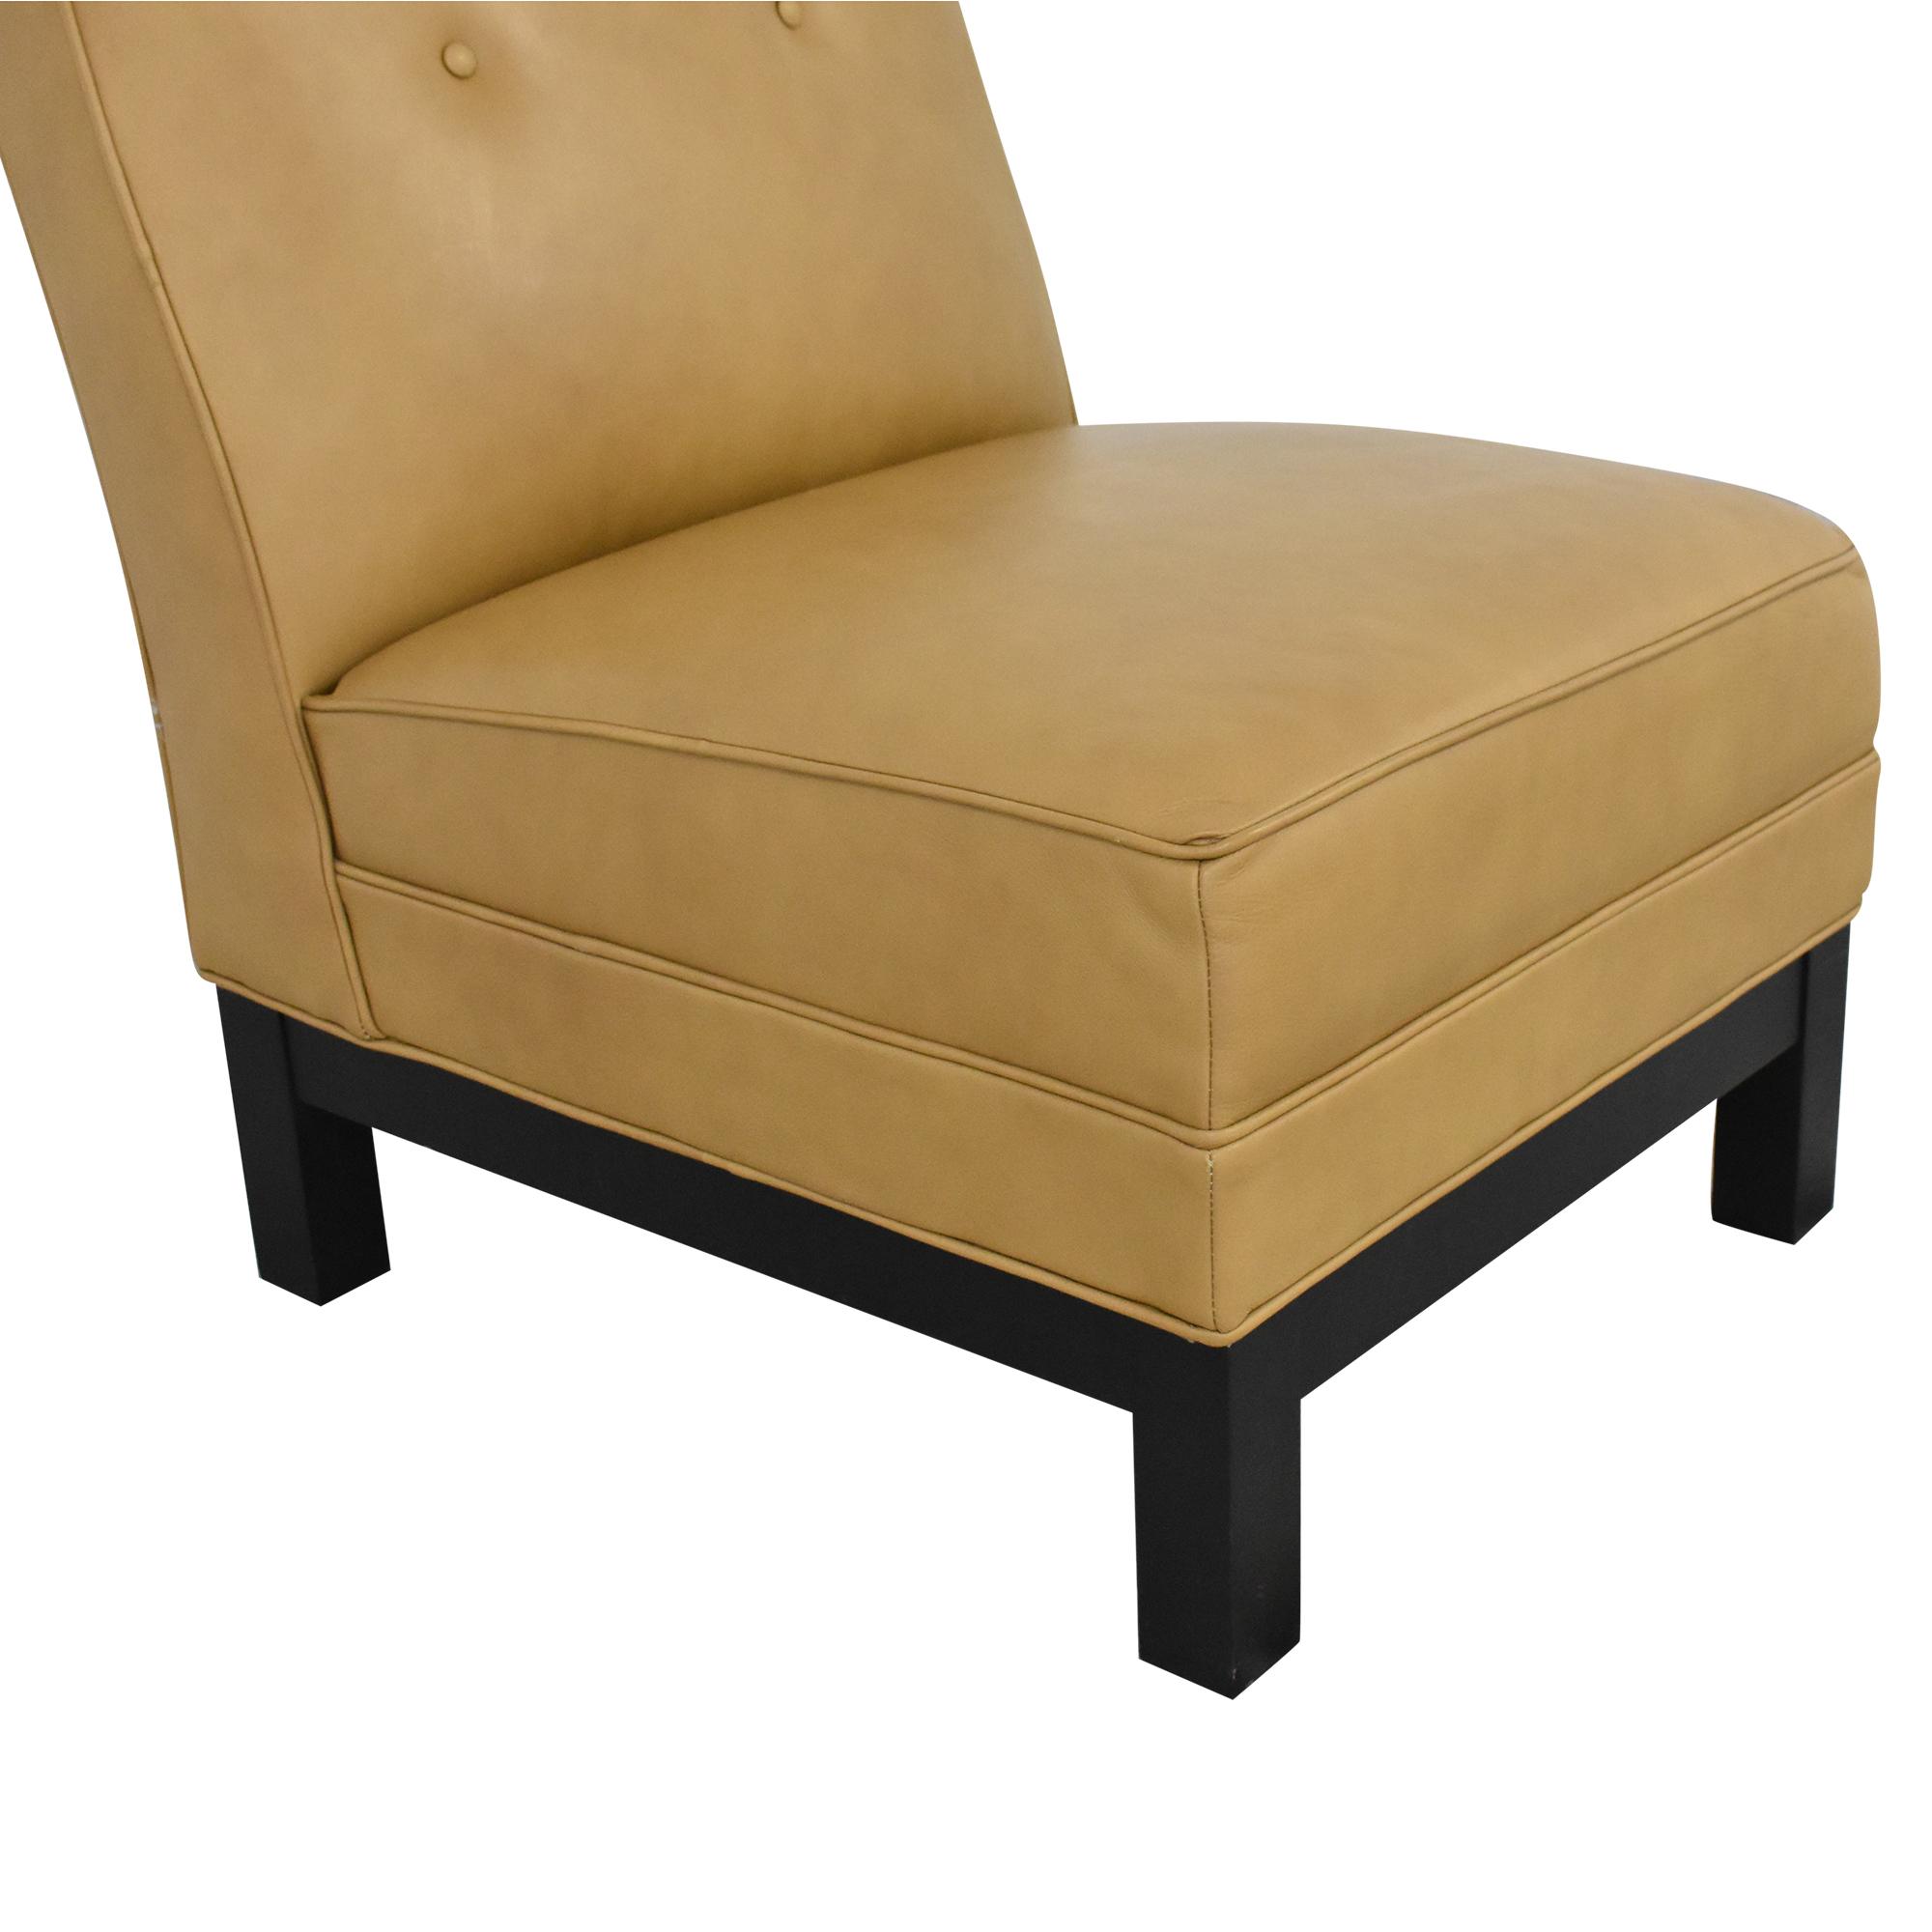 buy Mitchell Gold + Bob Williams Mitchell Gold + Bob Williams Liana Chair online